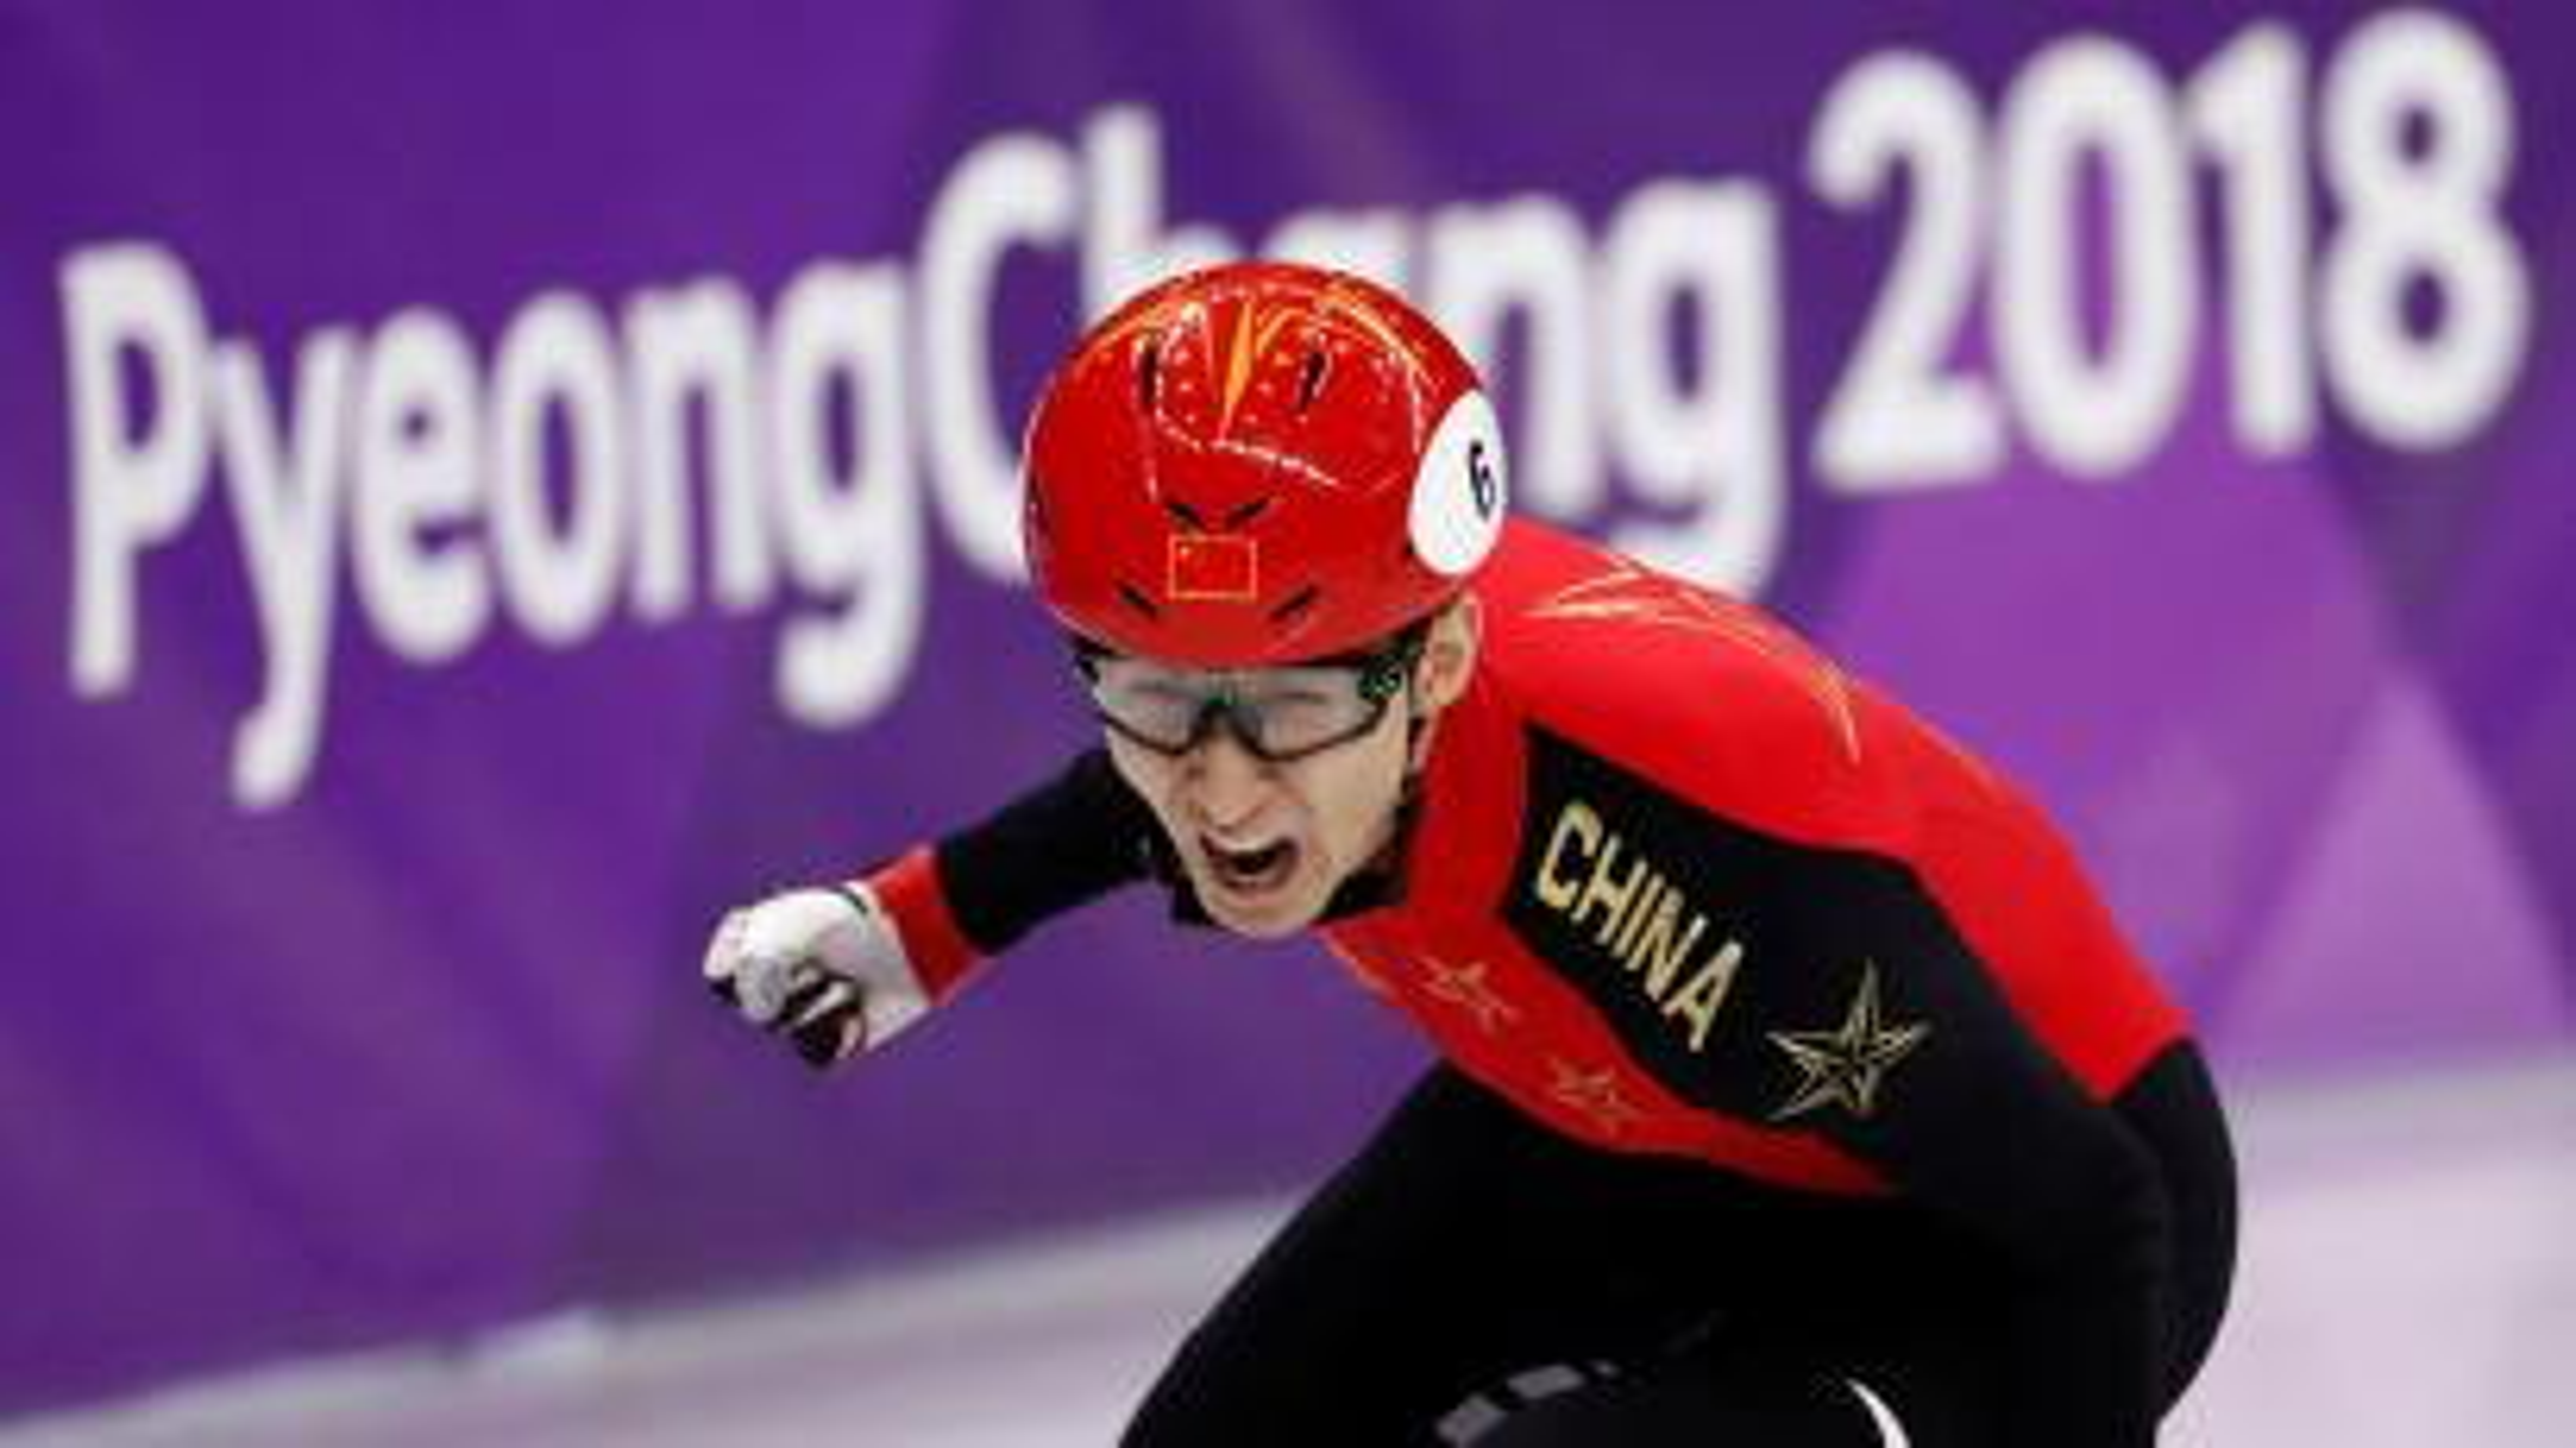 Short Track Speed Skating Events - Pyeongchang 2018 Winter Olympics - Men's 500m Final - Gangneung Ice Arena - Gangneung, South Korea - February 22, 2018 - Wu Dajing of China reacts.